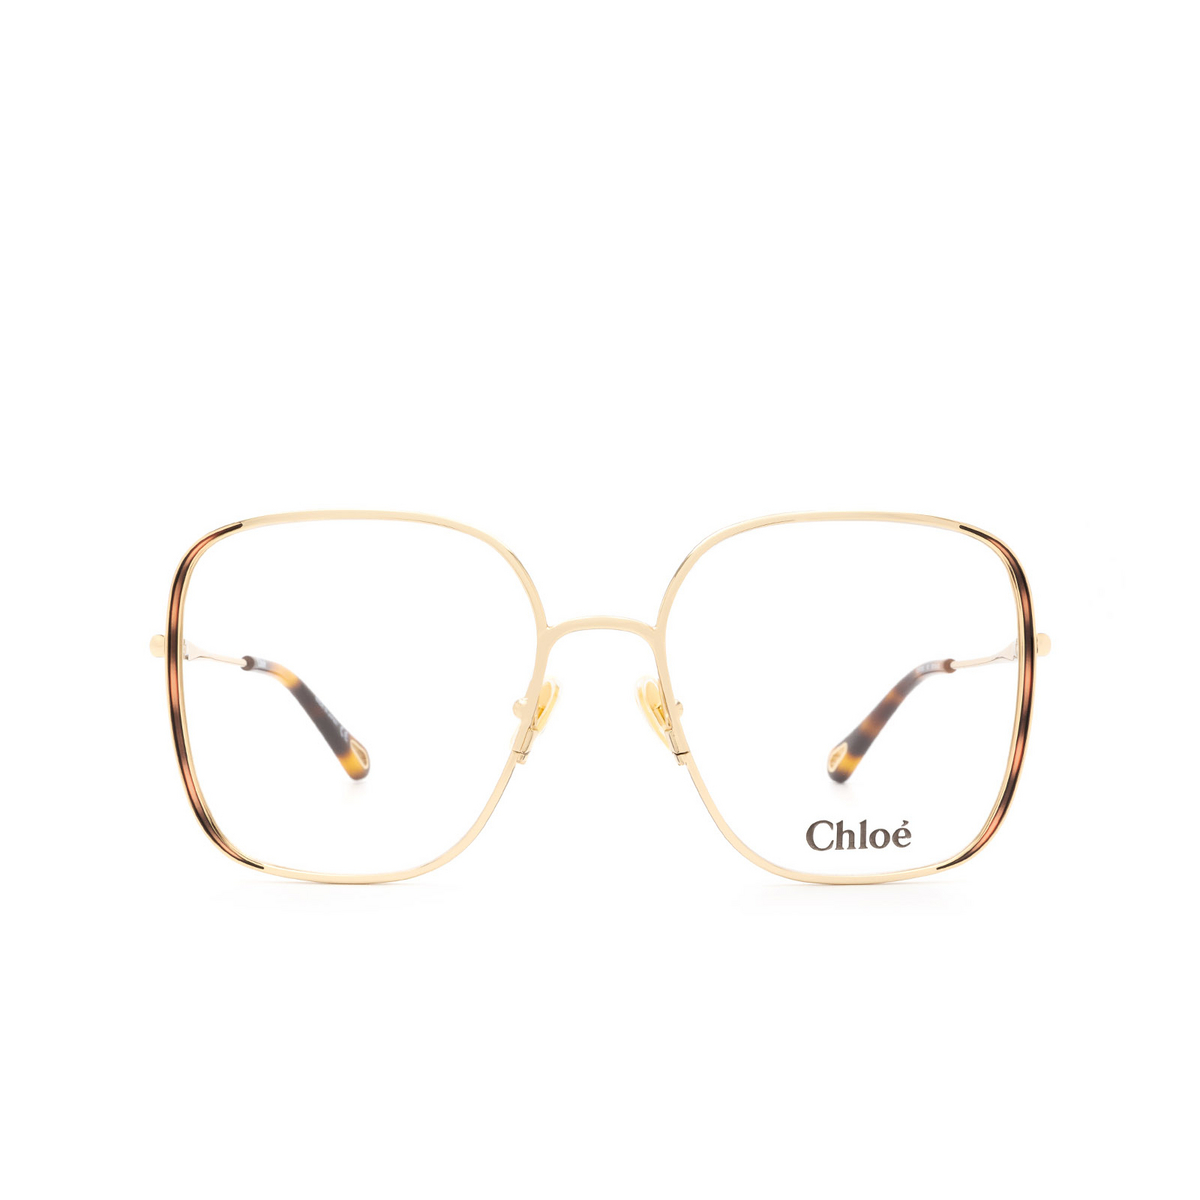 Chloé® Square Eyeglasses: CH0038O color Gold & Havana 001 - front view.